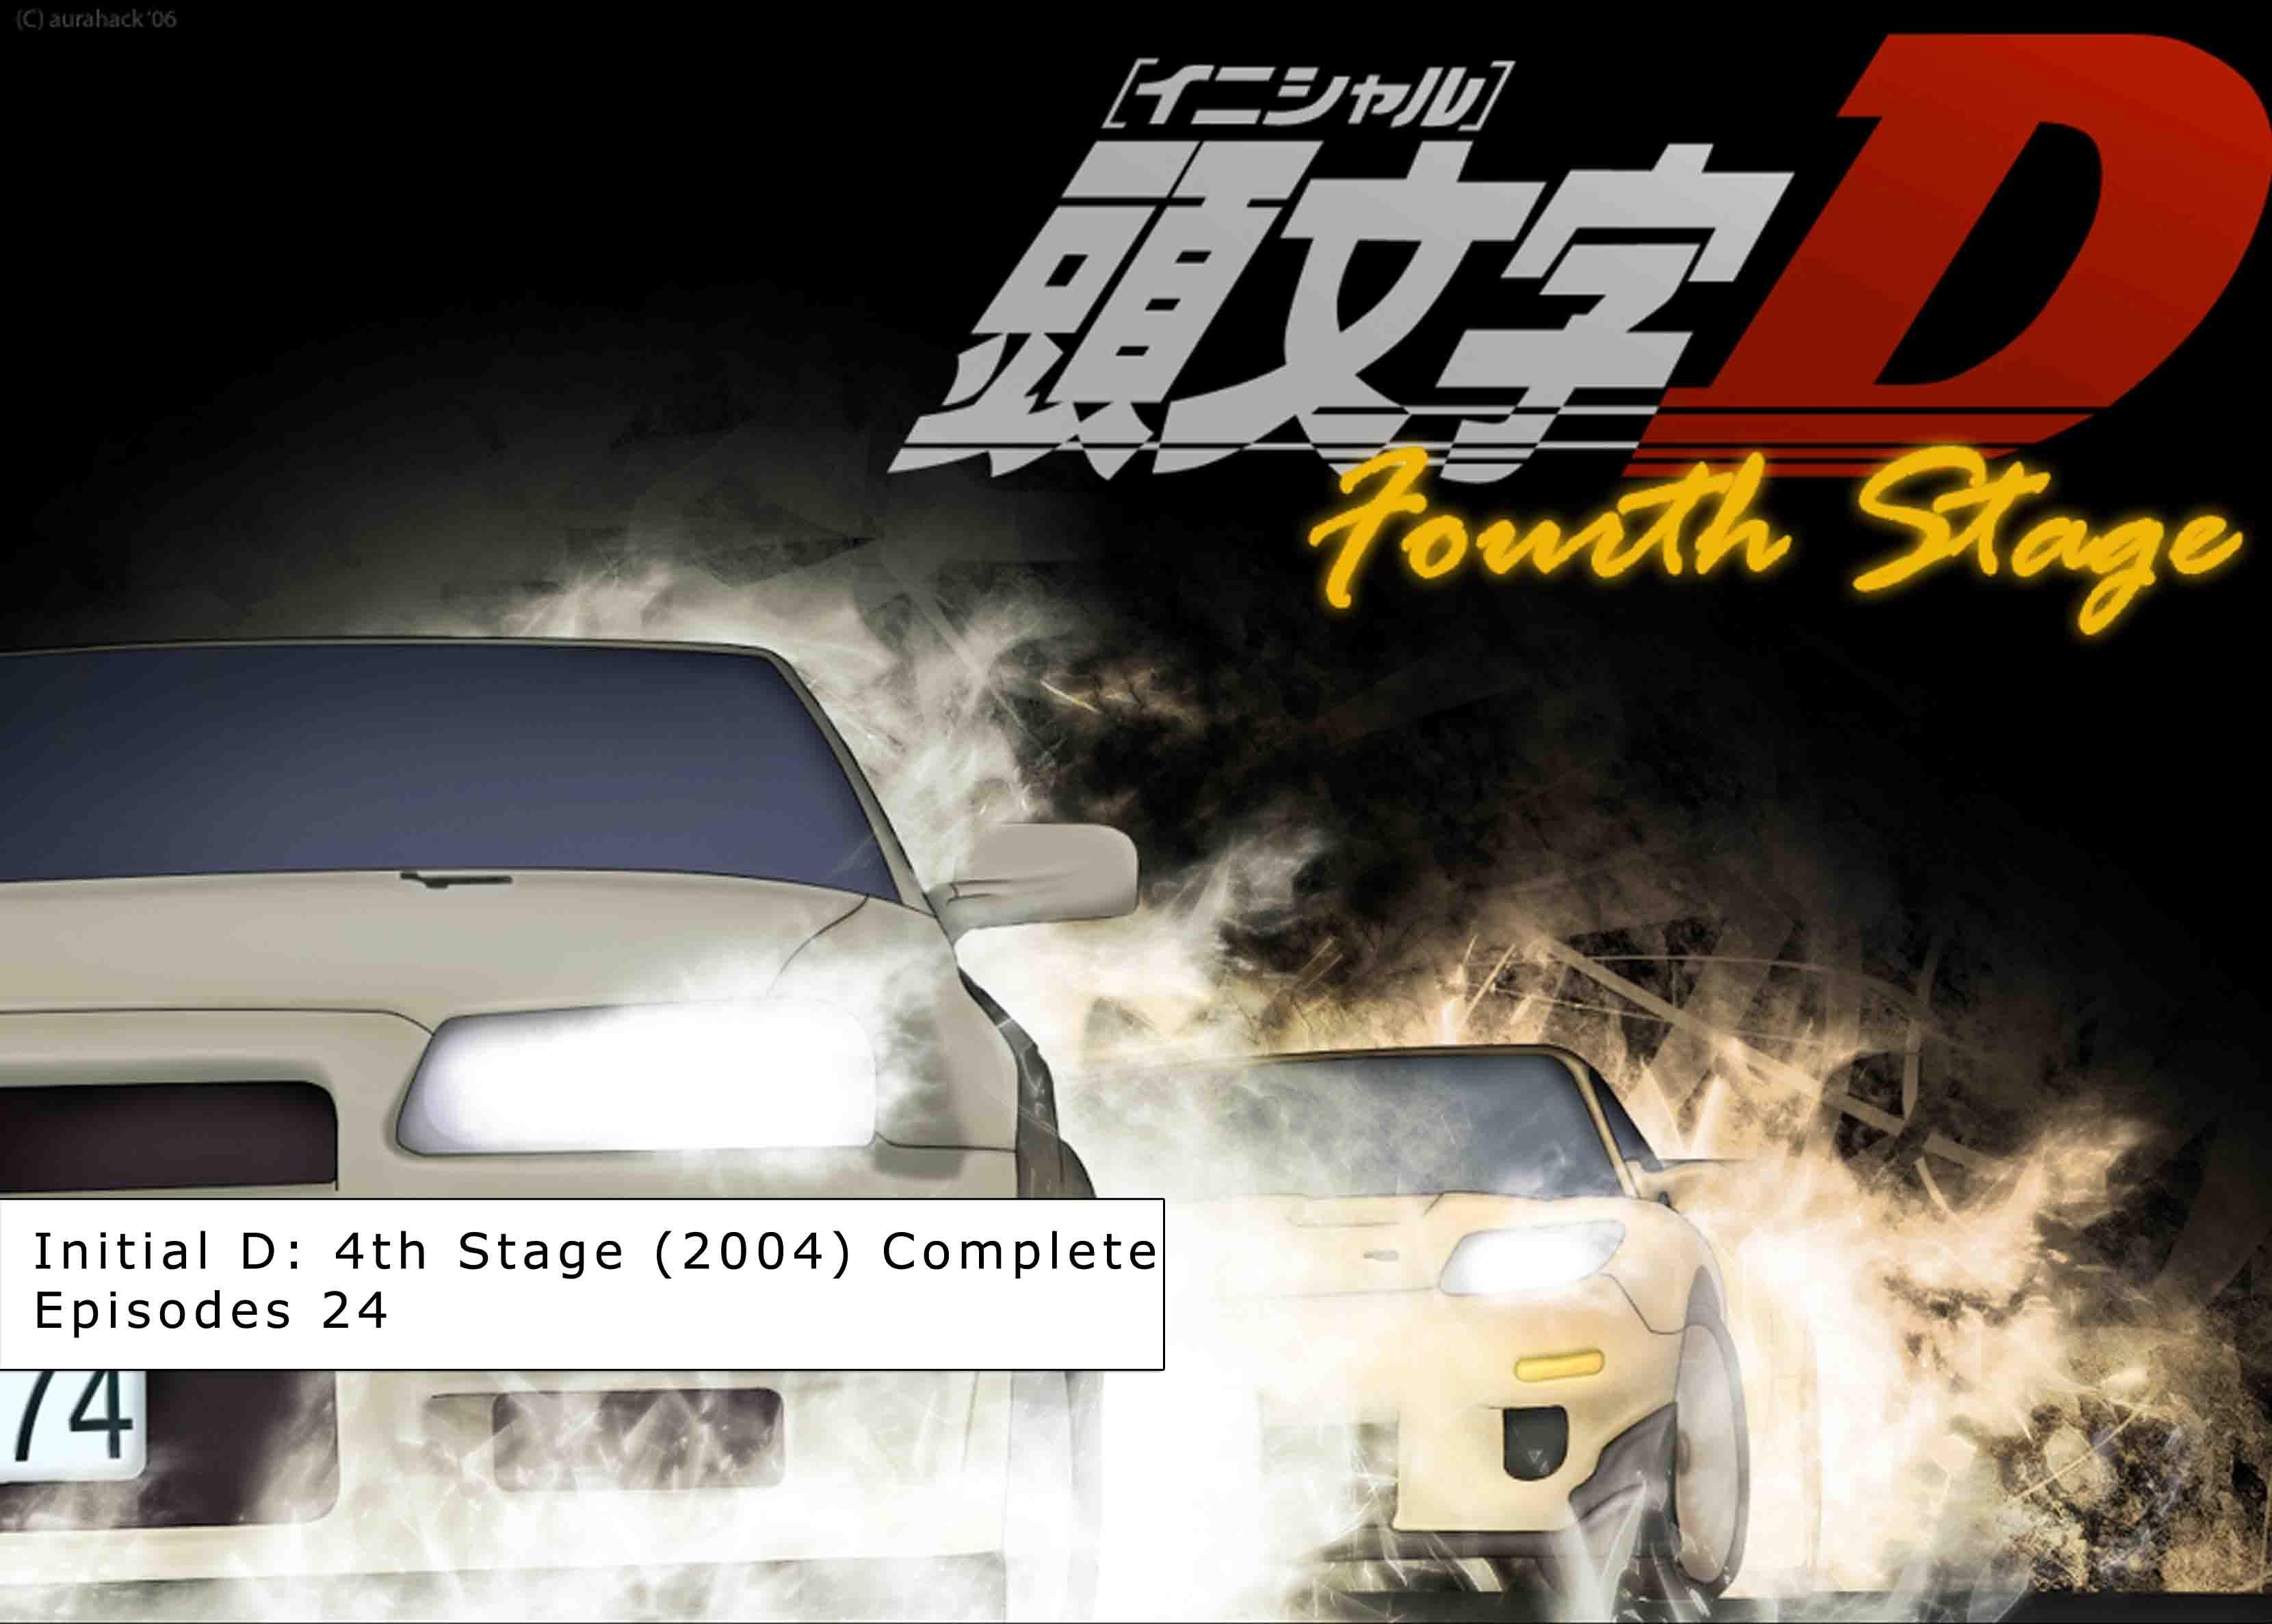 Initial D 4th Stage 頭文字d, イニシャルd, イニシャル